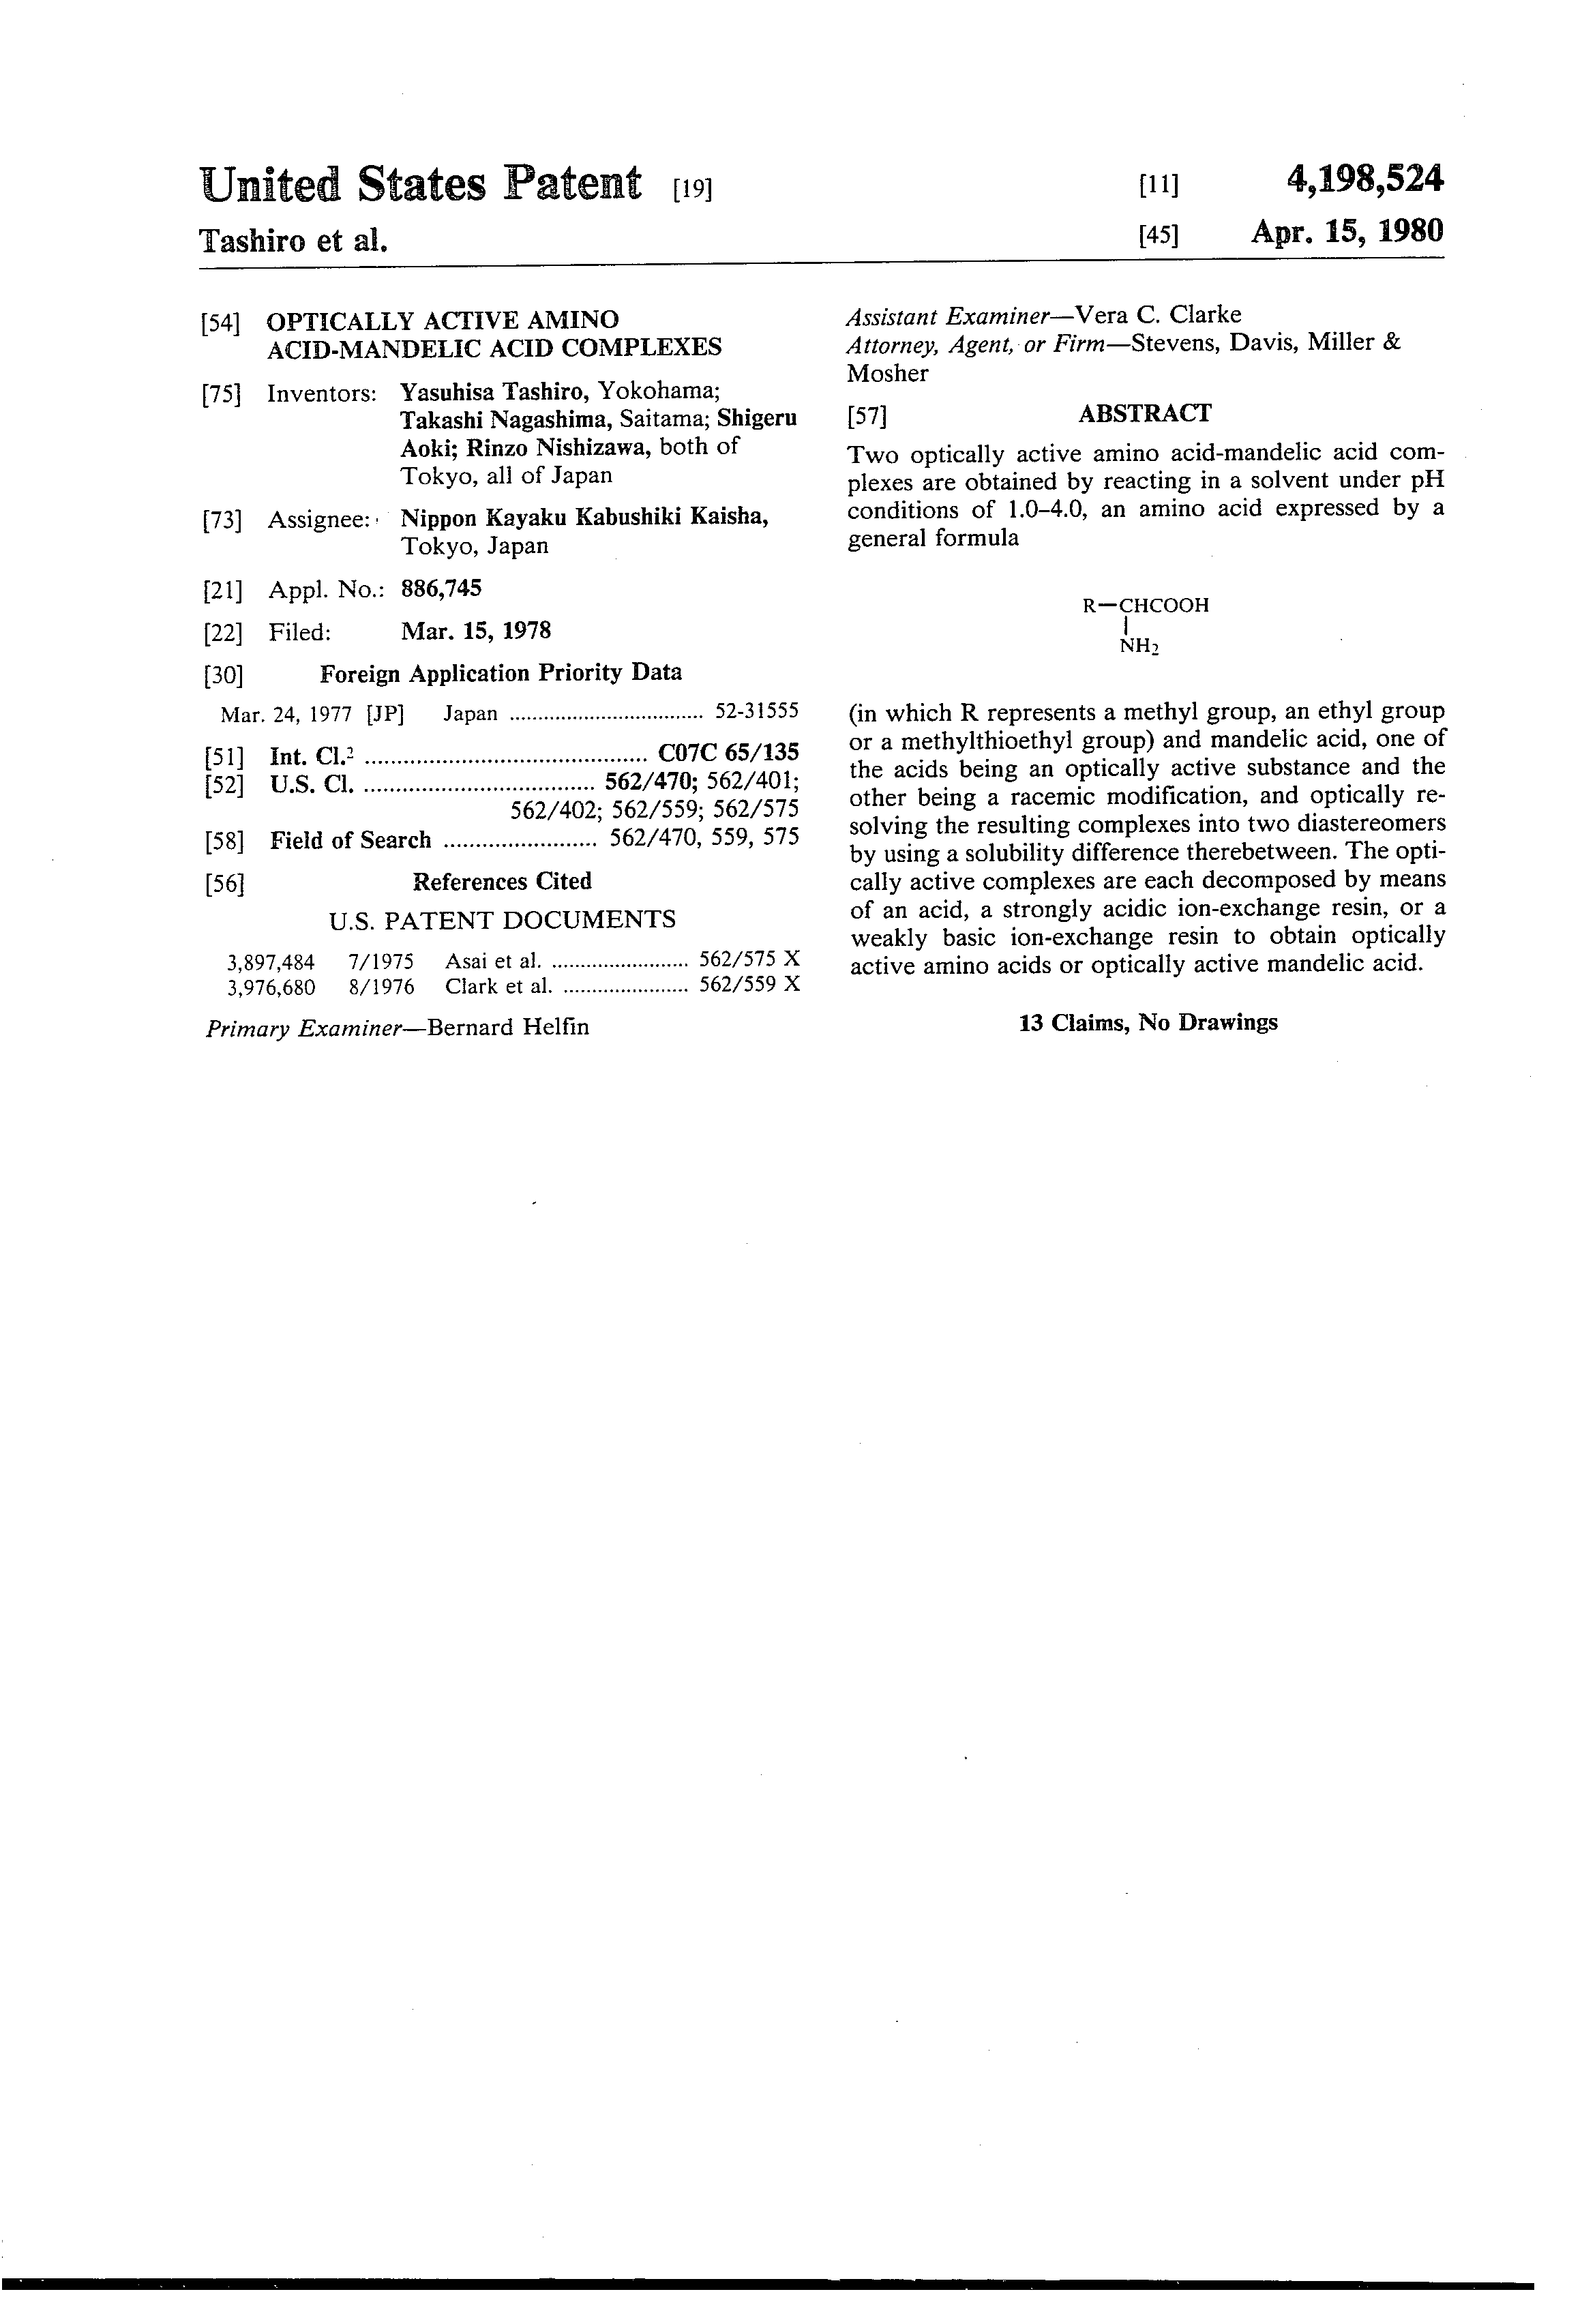 US 4198524 A - Optically Active Amino Acid-mandelic Acid